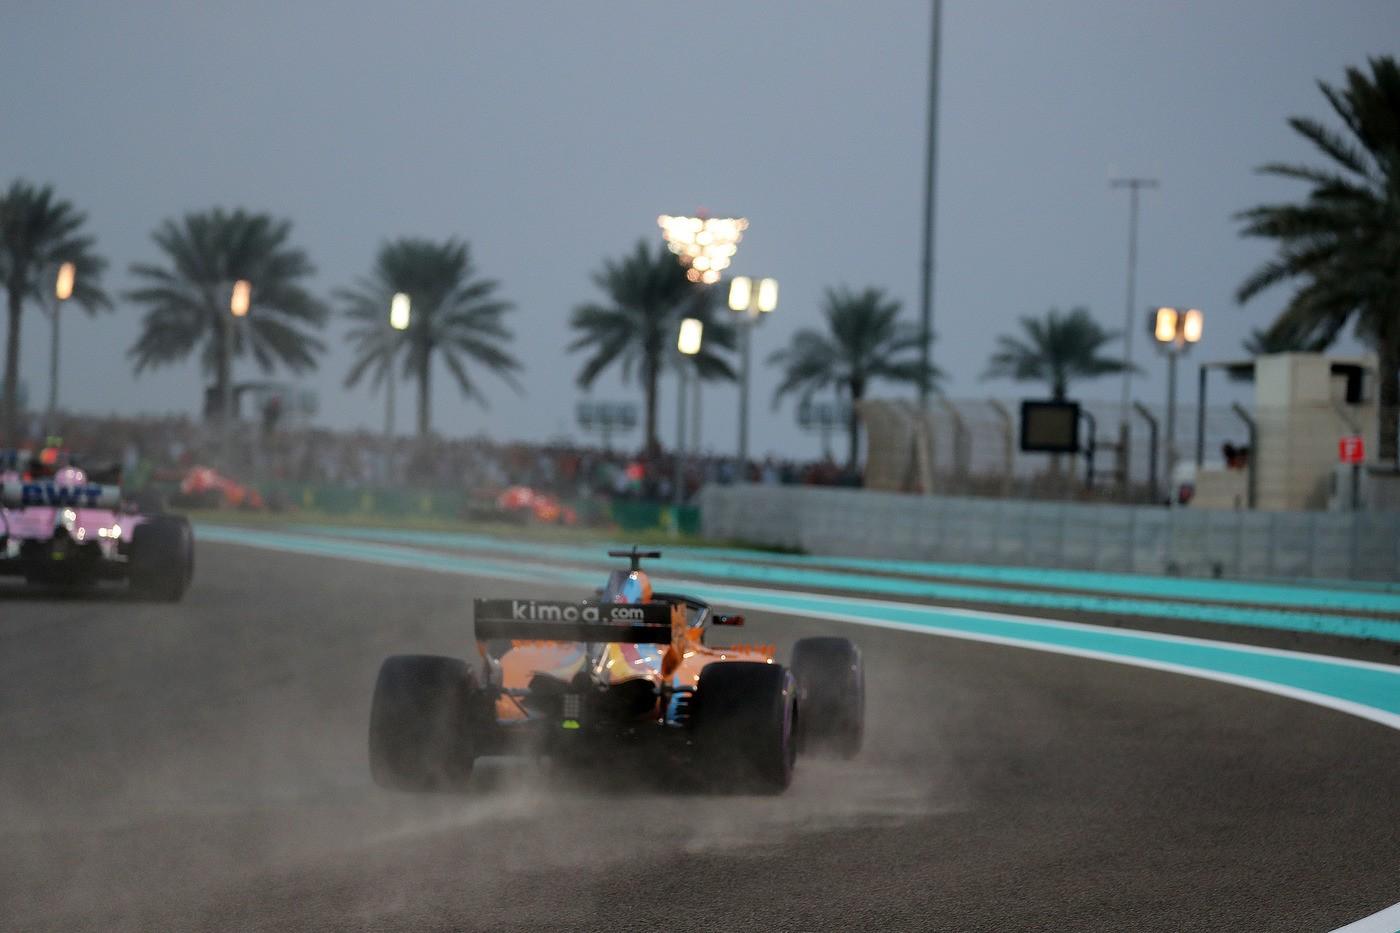 © Photo4 / LaPresse 25/11/2018 Abu Dhabi, UAE Sport Grand Prix Formula One Abu Dhabi 2018 In the pic: Fernando Alonso (ESP) McLaren MCL32